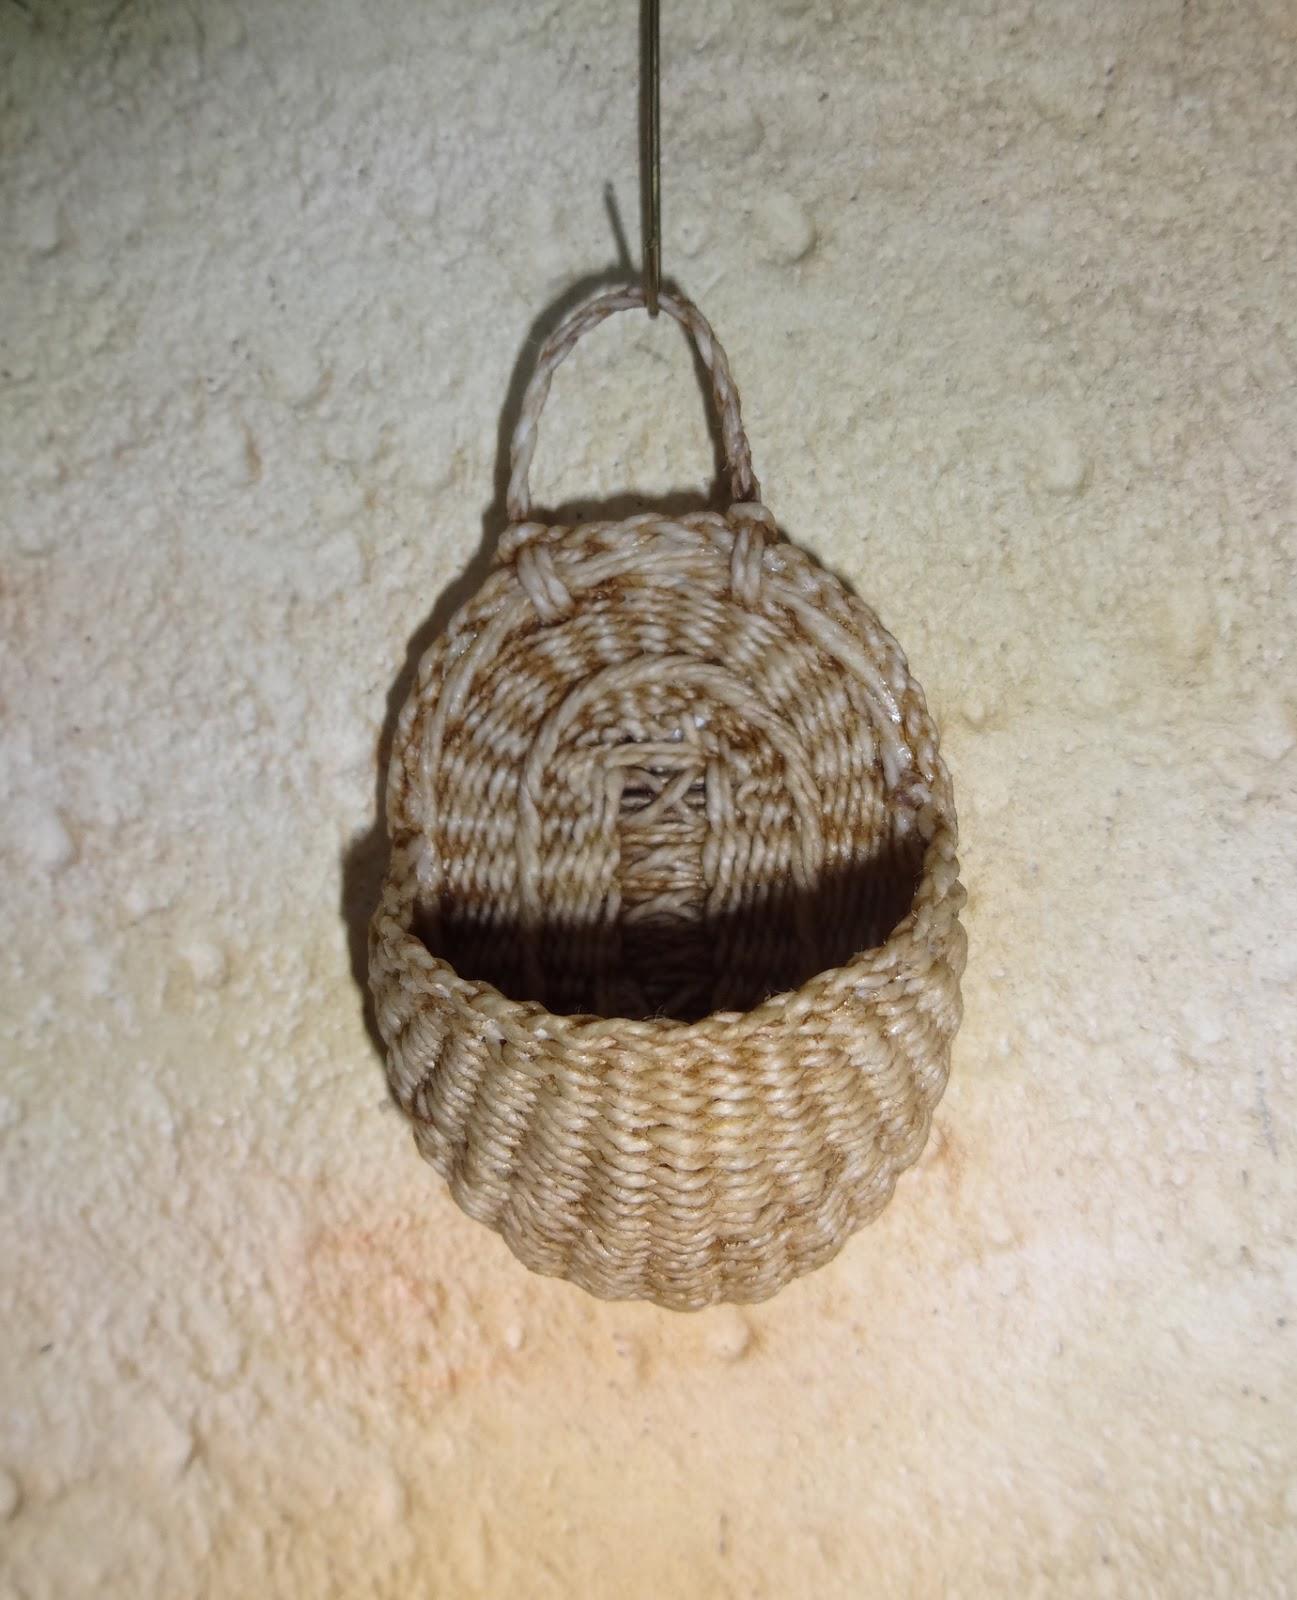 Wall Hanging Basket basketcase miniatures: some wall hanging baskets